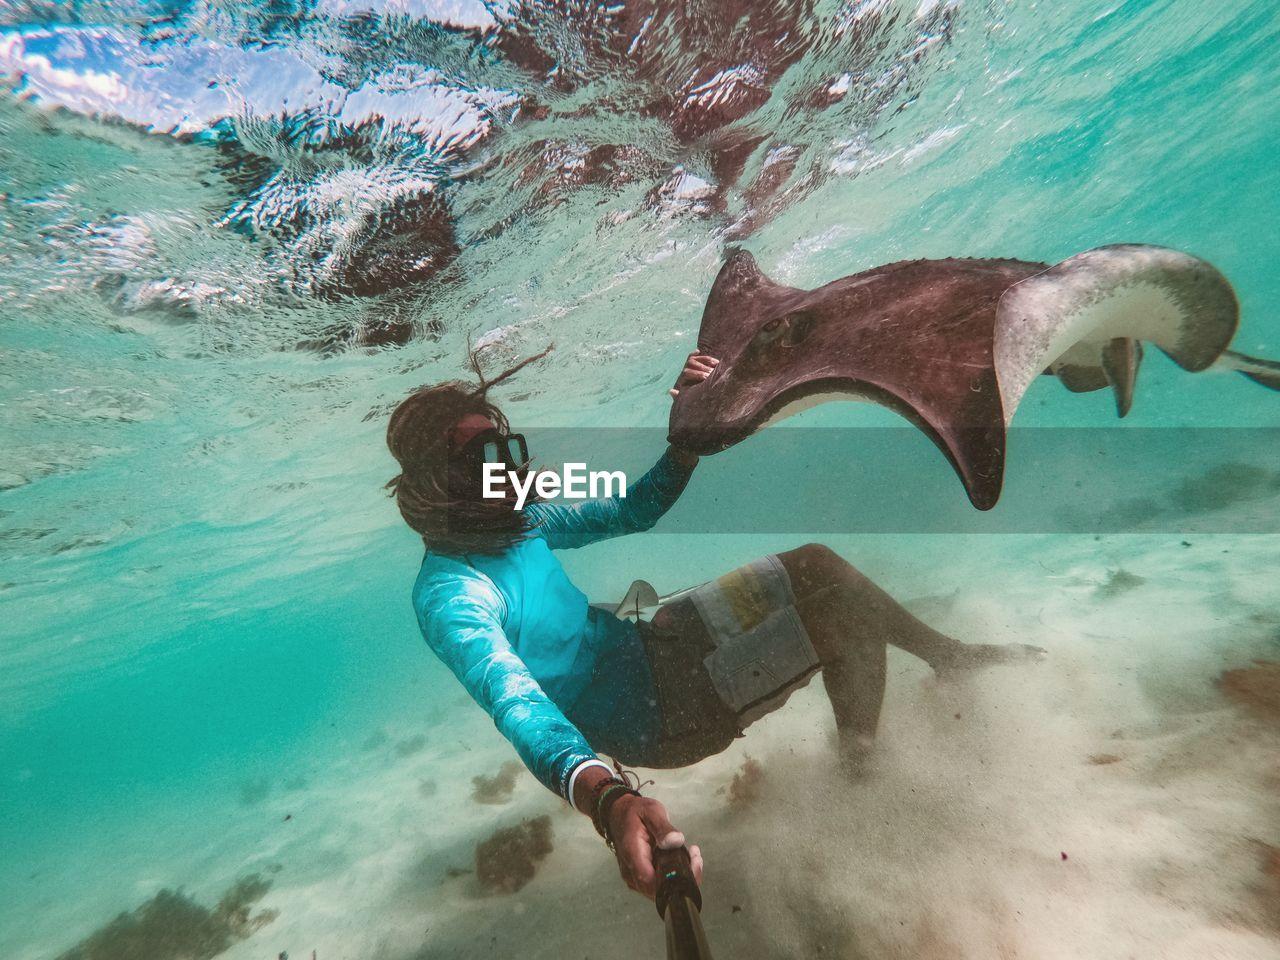 sea, water, underwater, swimming, undersea, sport, aquatic sport, one person, full length, adventure, real people, nature, leisure activity, exploration, lifestyles, scuba diving, outdoors, marine, snorkeling, eyewear